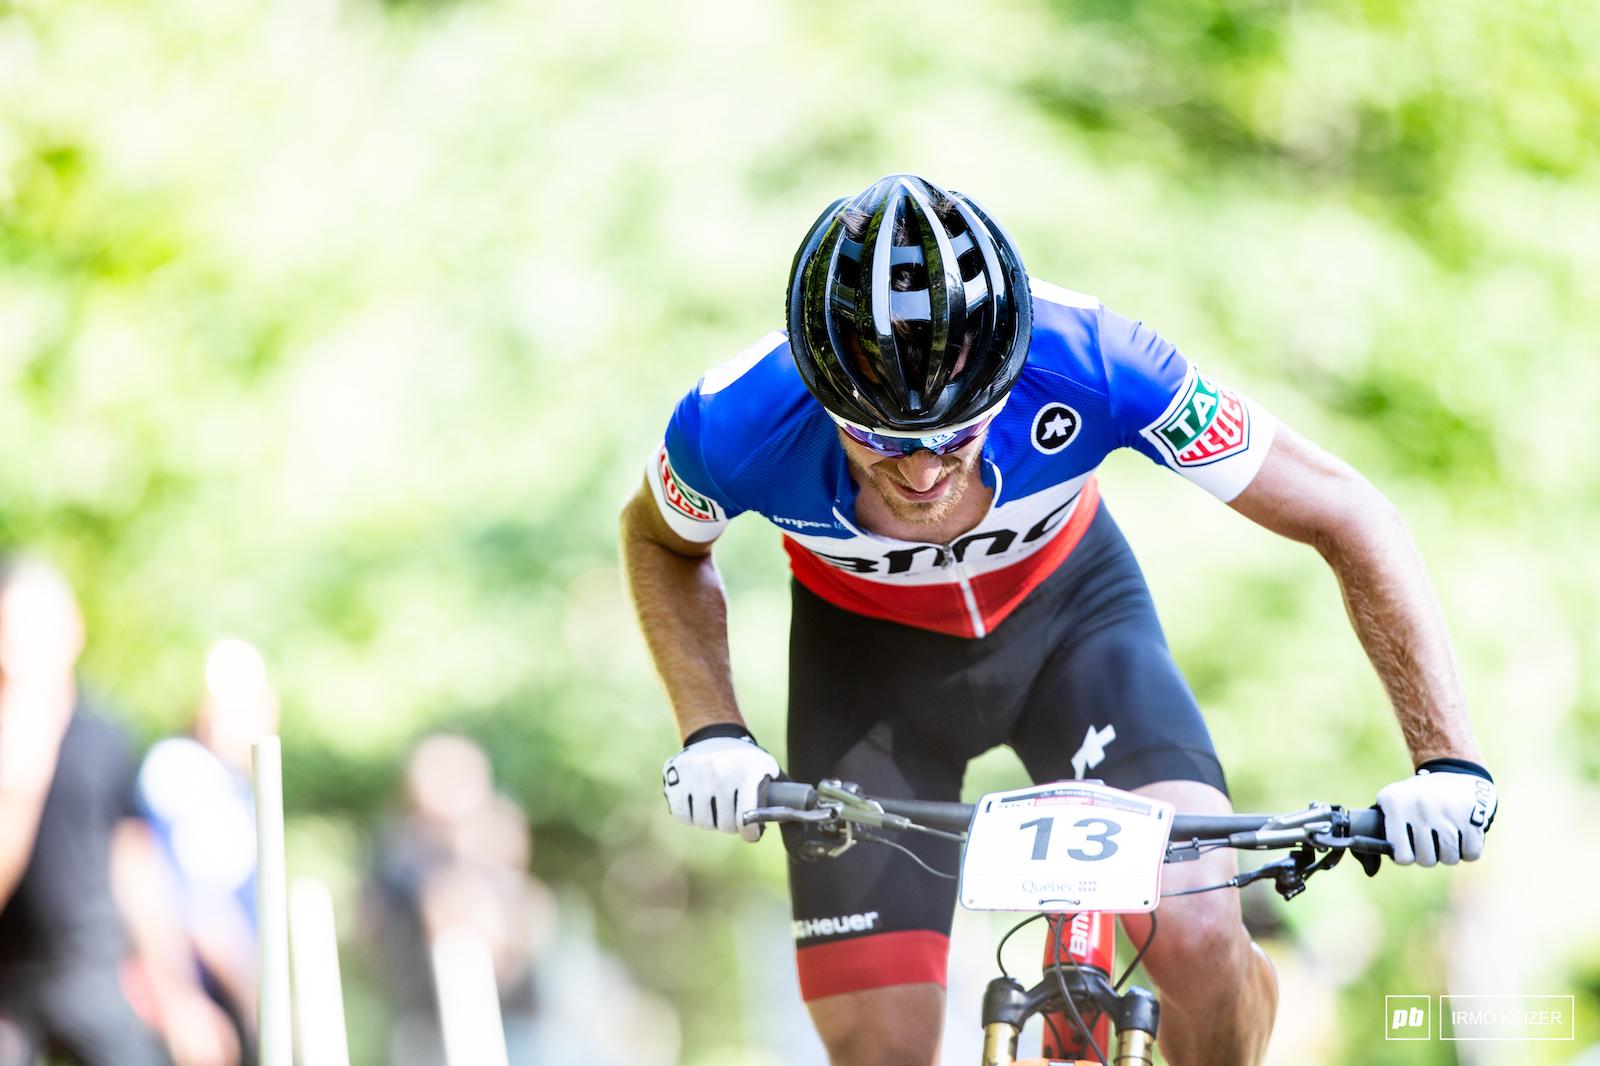 Titouan Carod rode an impressive race and took third.